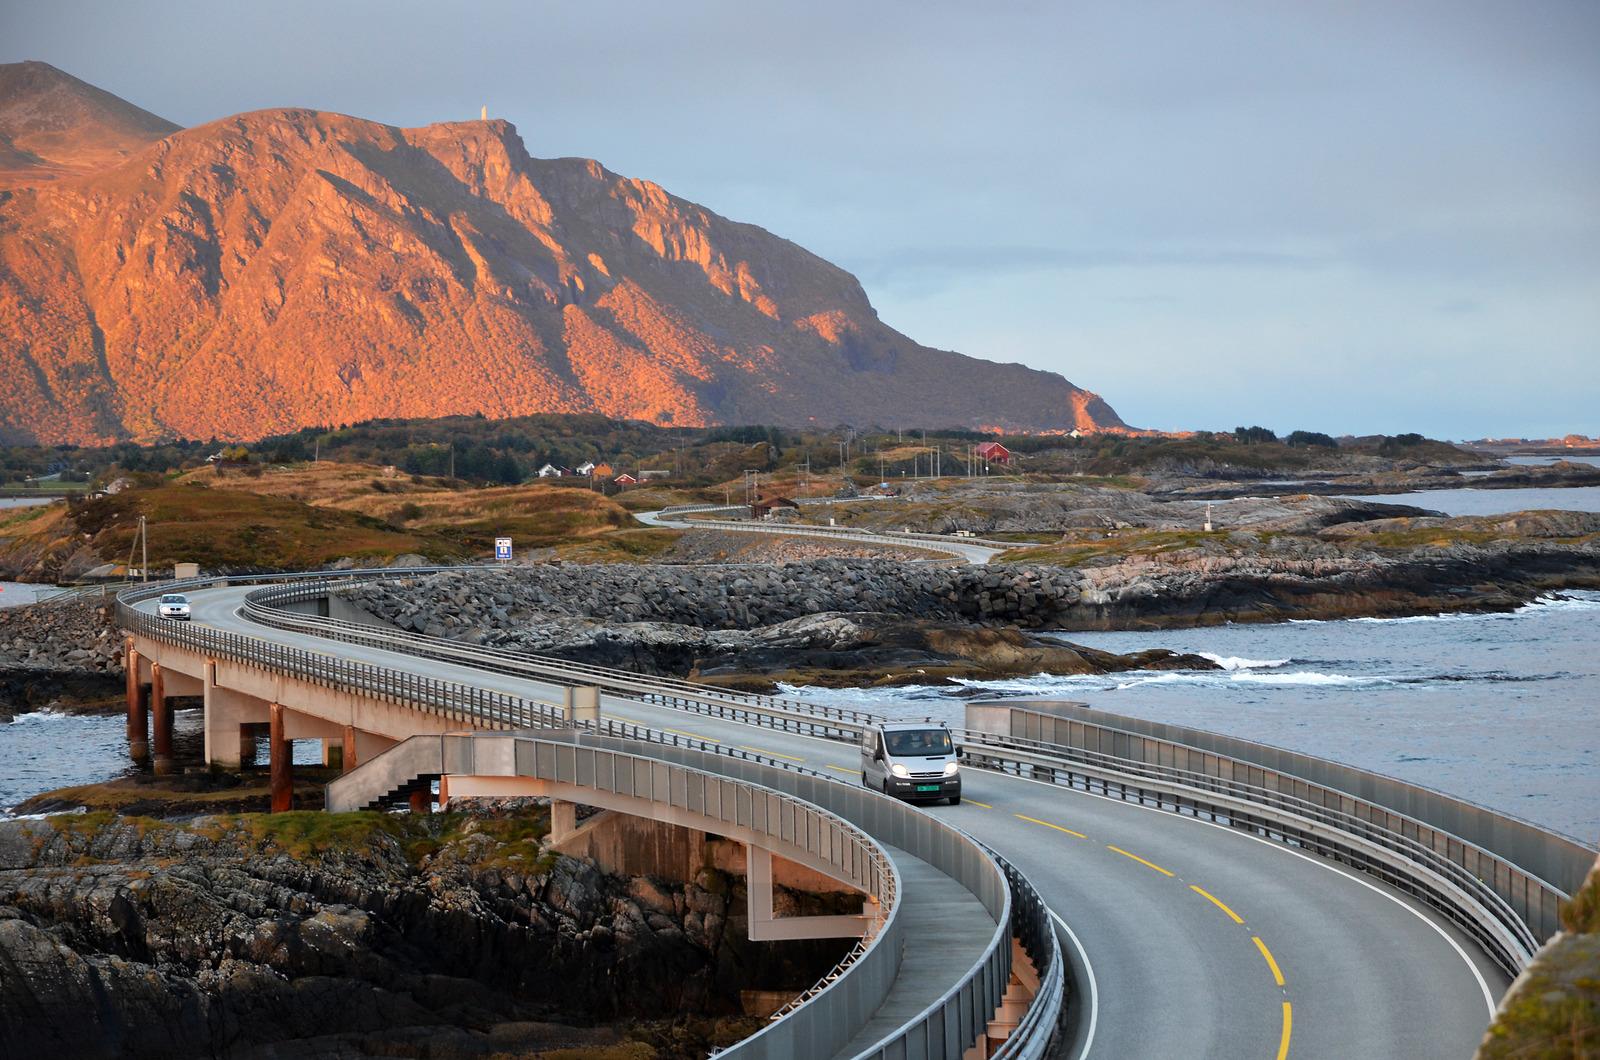 Atlantic Road - Atlanterhavsvegen, October 5th. Photo by Grete Kongshaug, Statens Vegvesen.